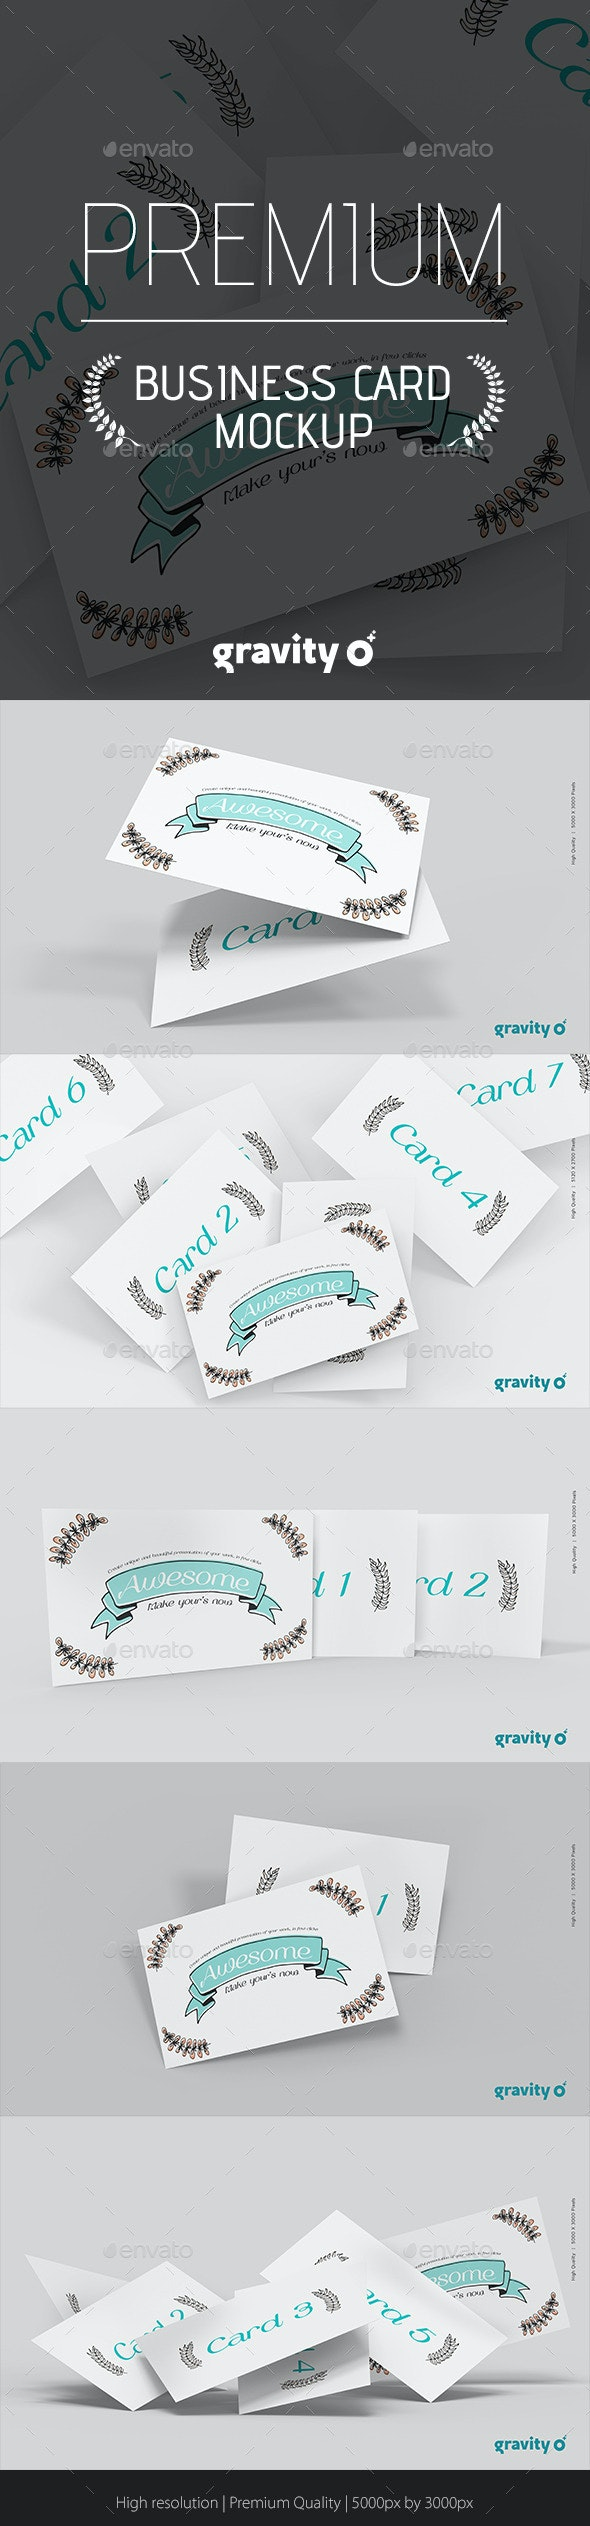 Business Card Mockup Gravity Zero - Business Cards Print